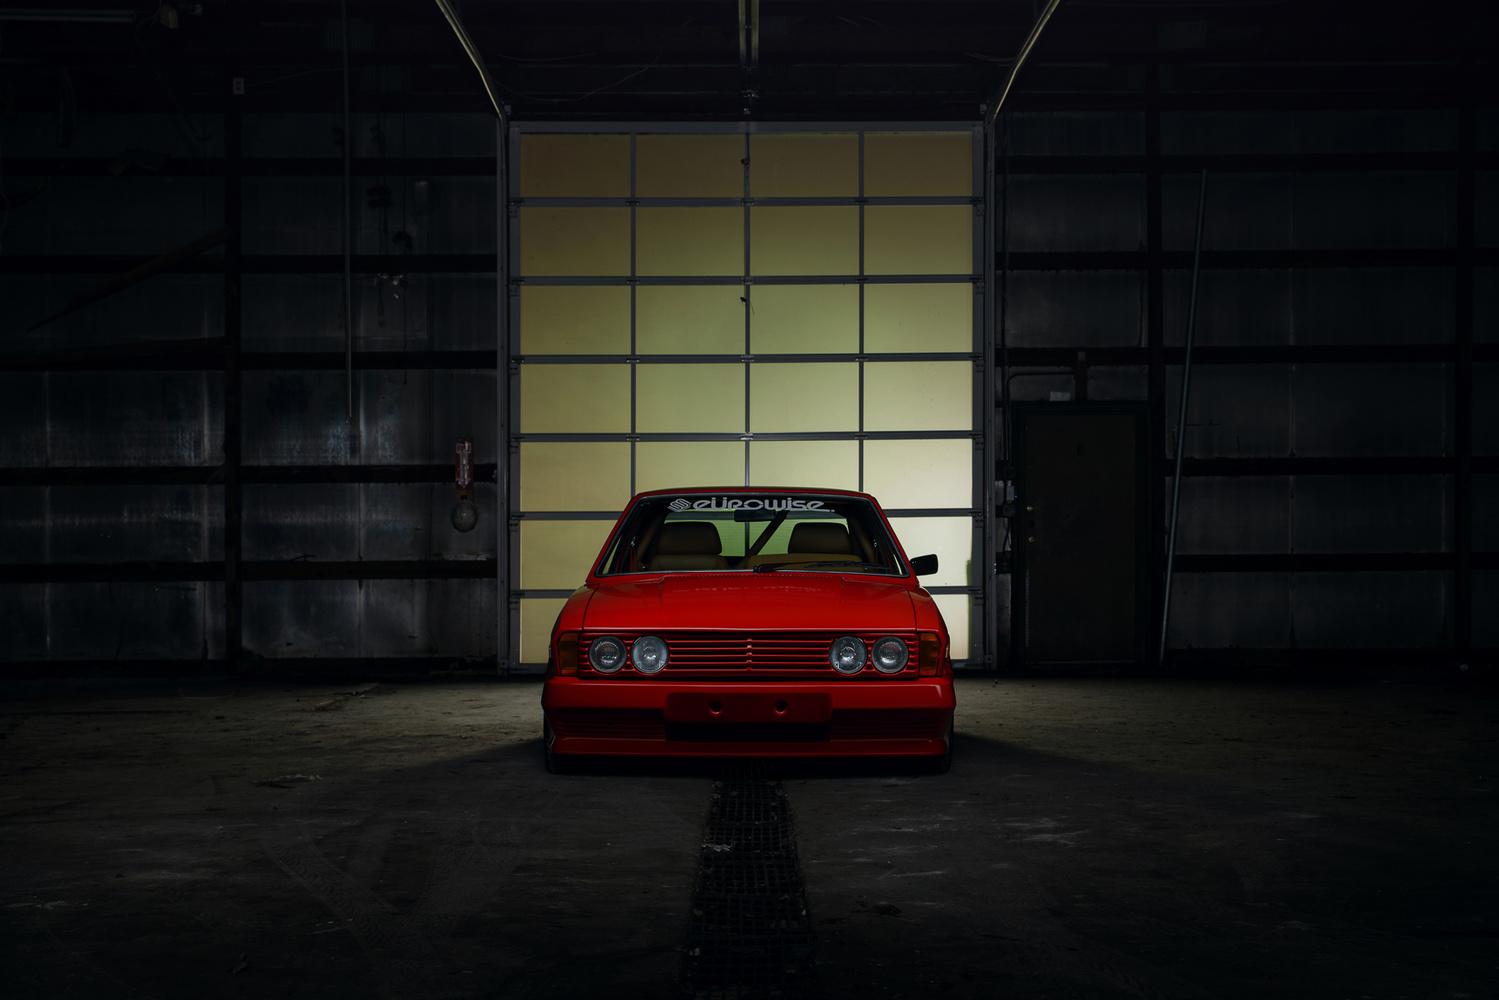 Singer-inspired, Porsche-engined, Volkswagen Scirocco by Dominic Mann